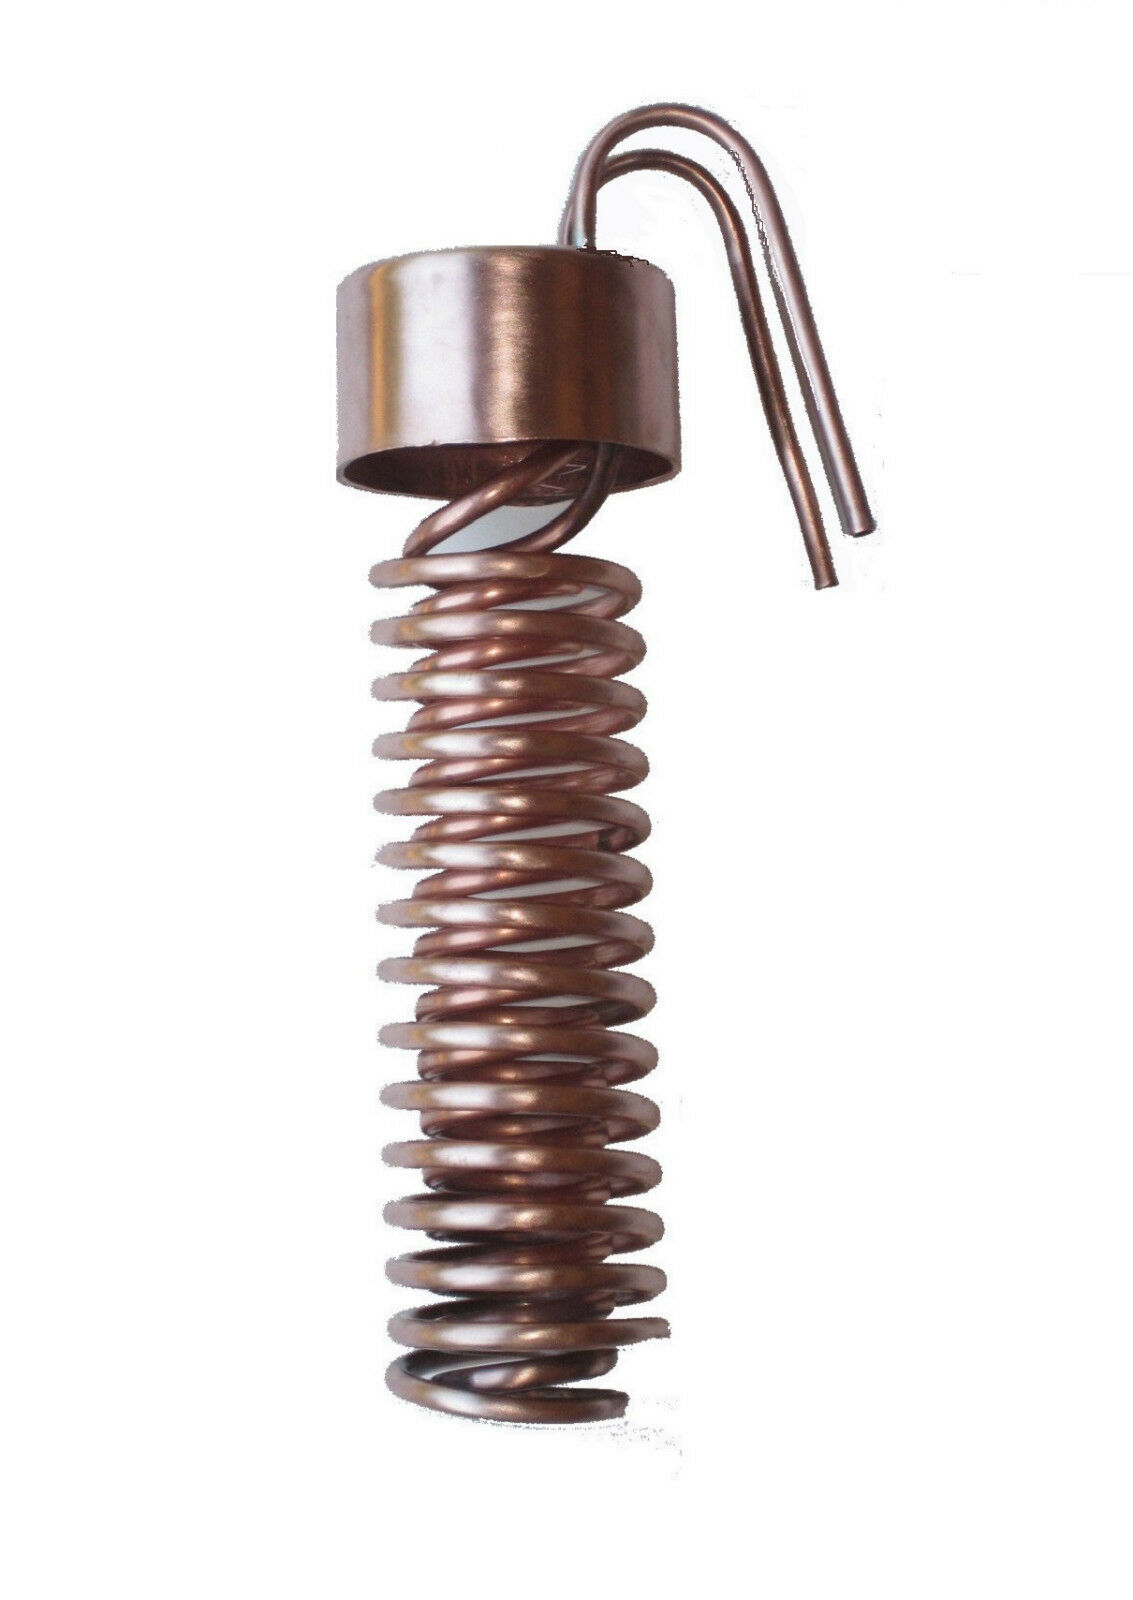 Graham coil condenser copper moonshine e85 pot reflux still 3